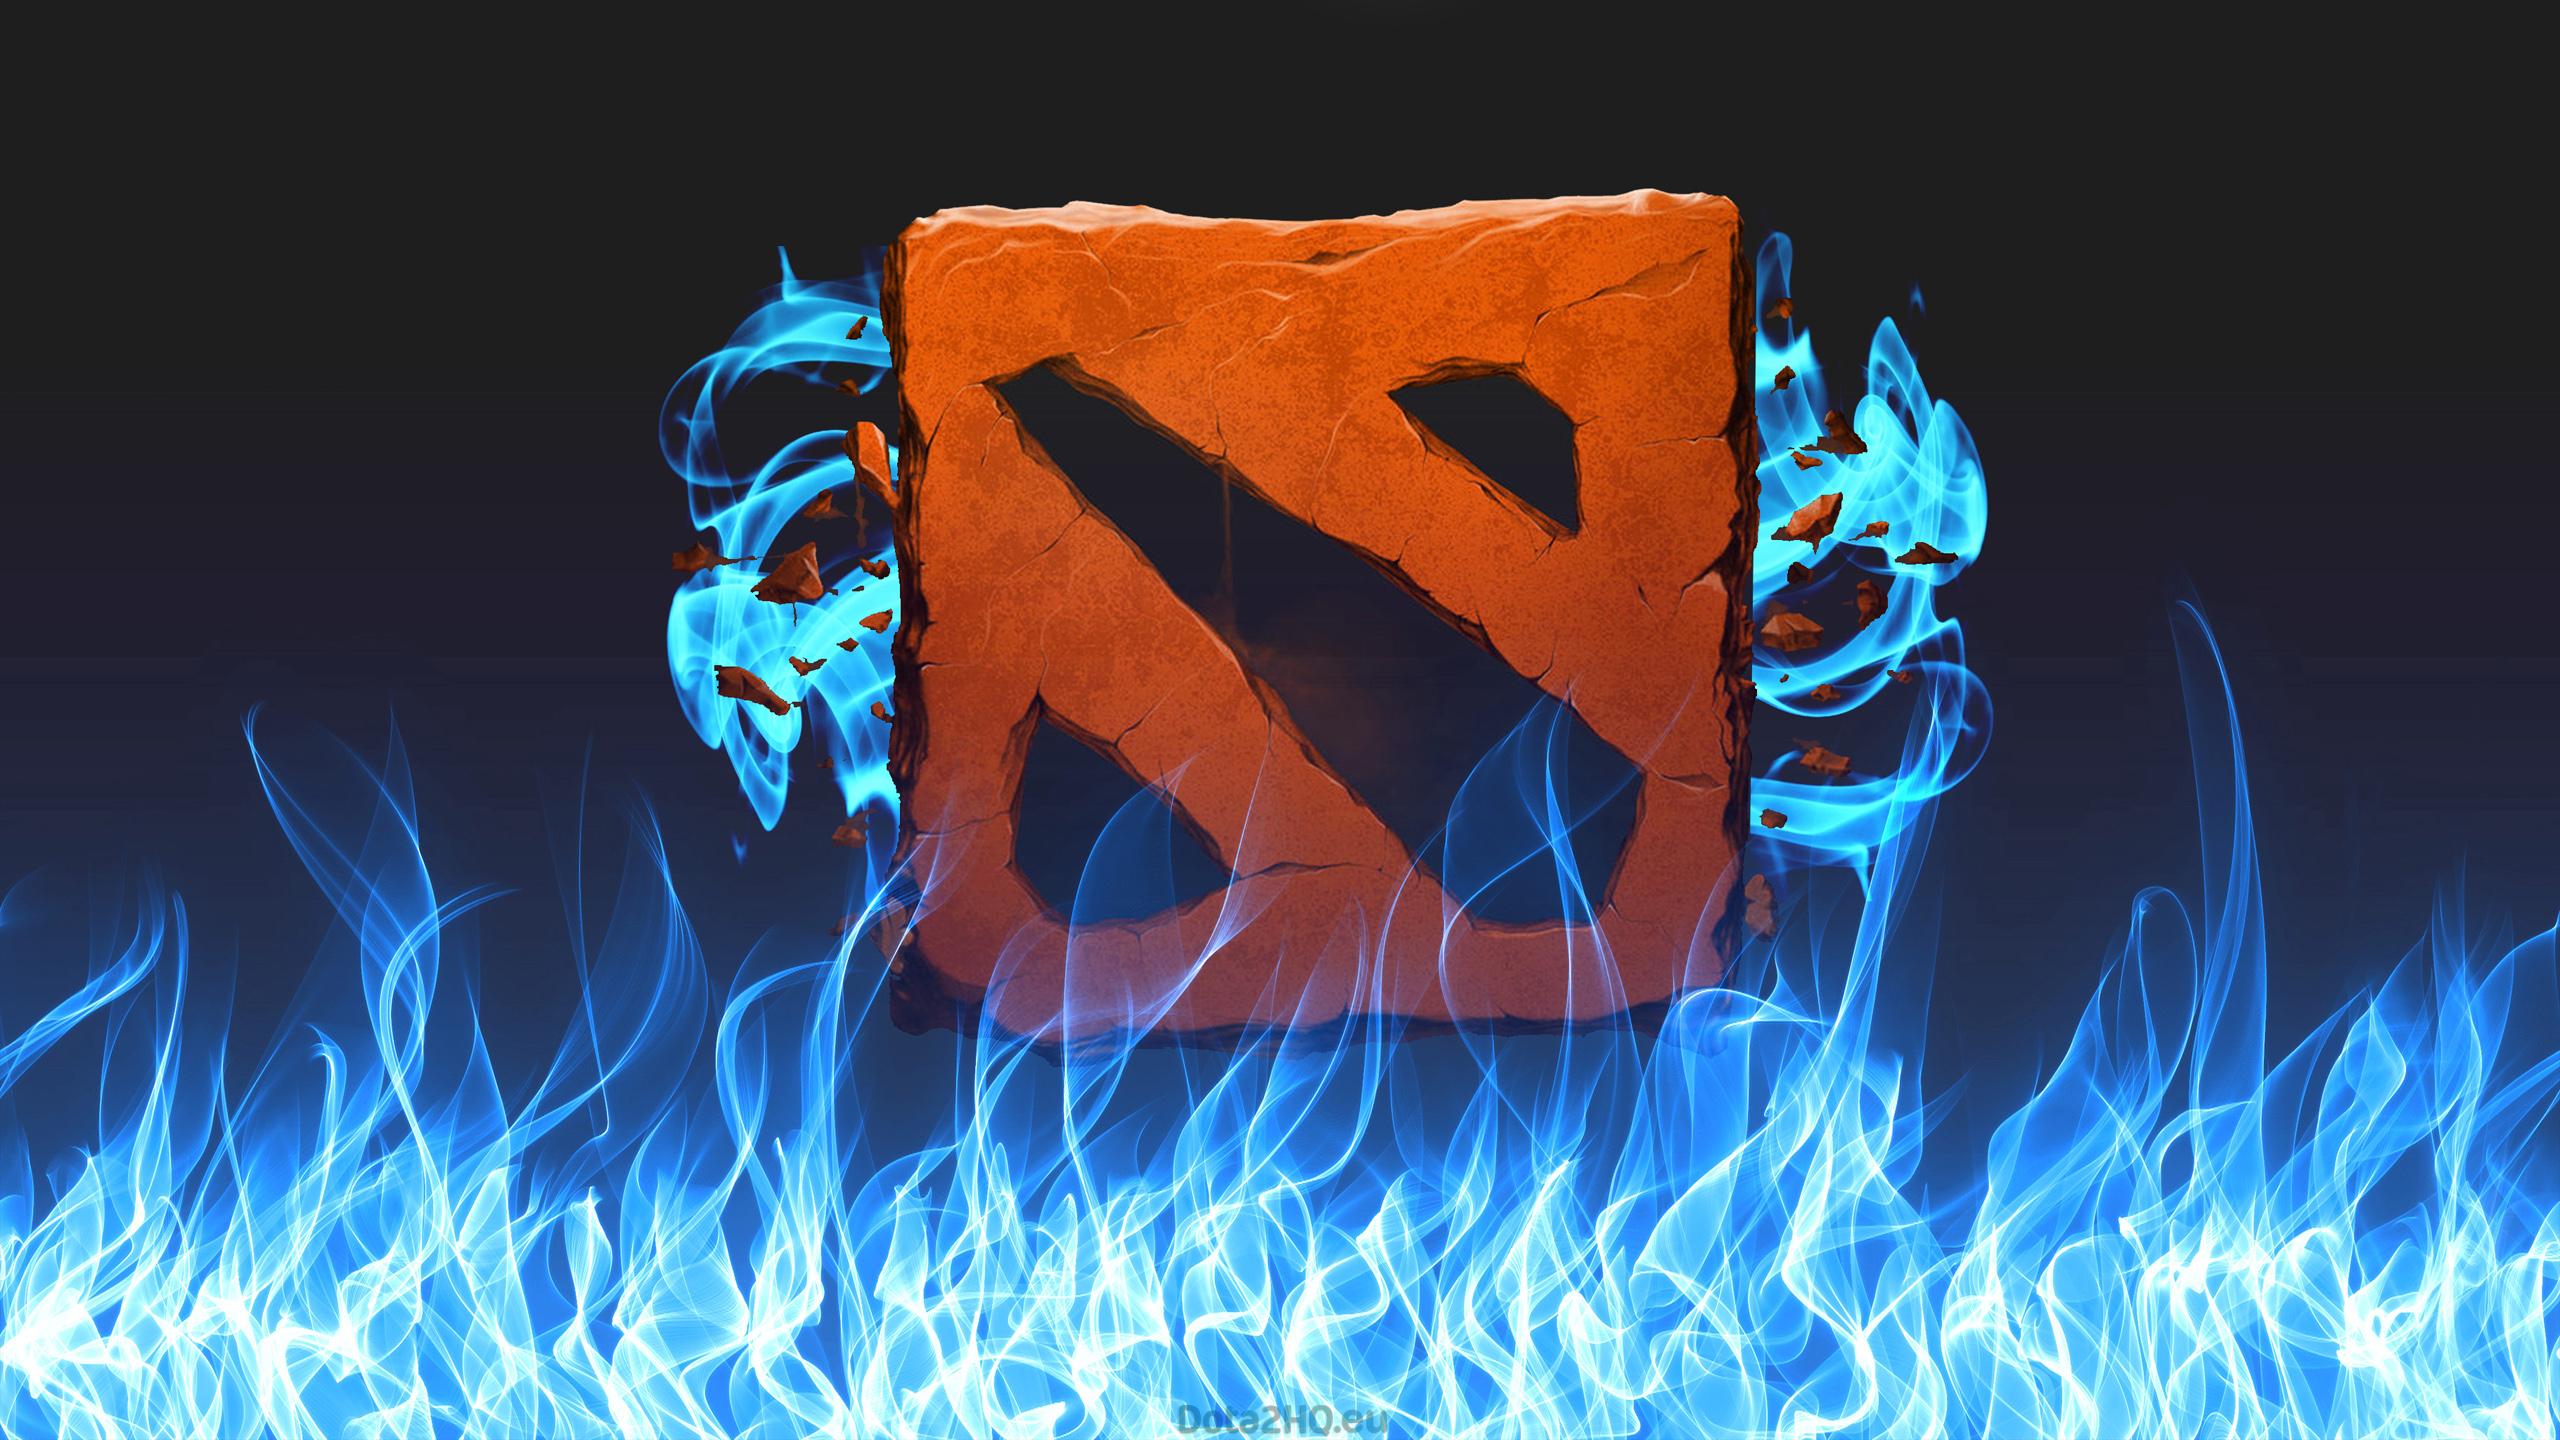 Dota2 Пламя, синий огонь